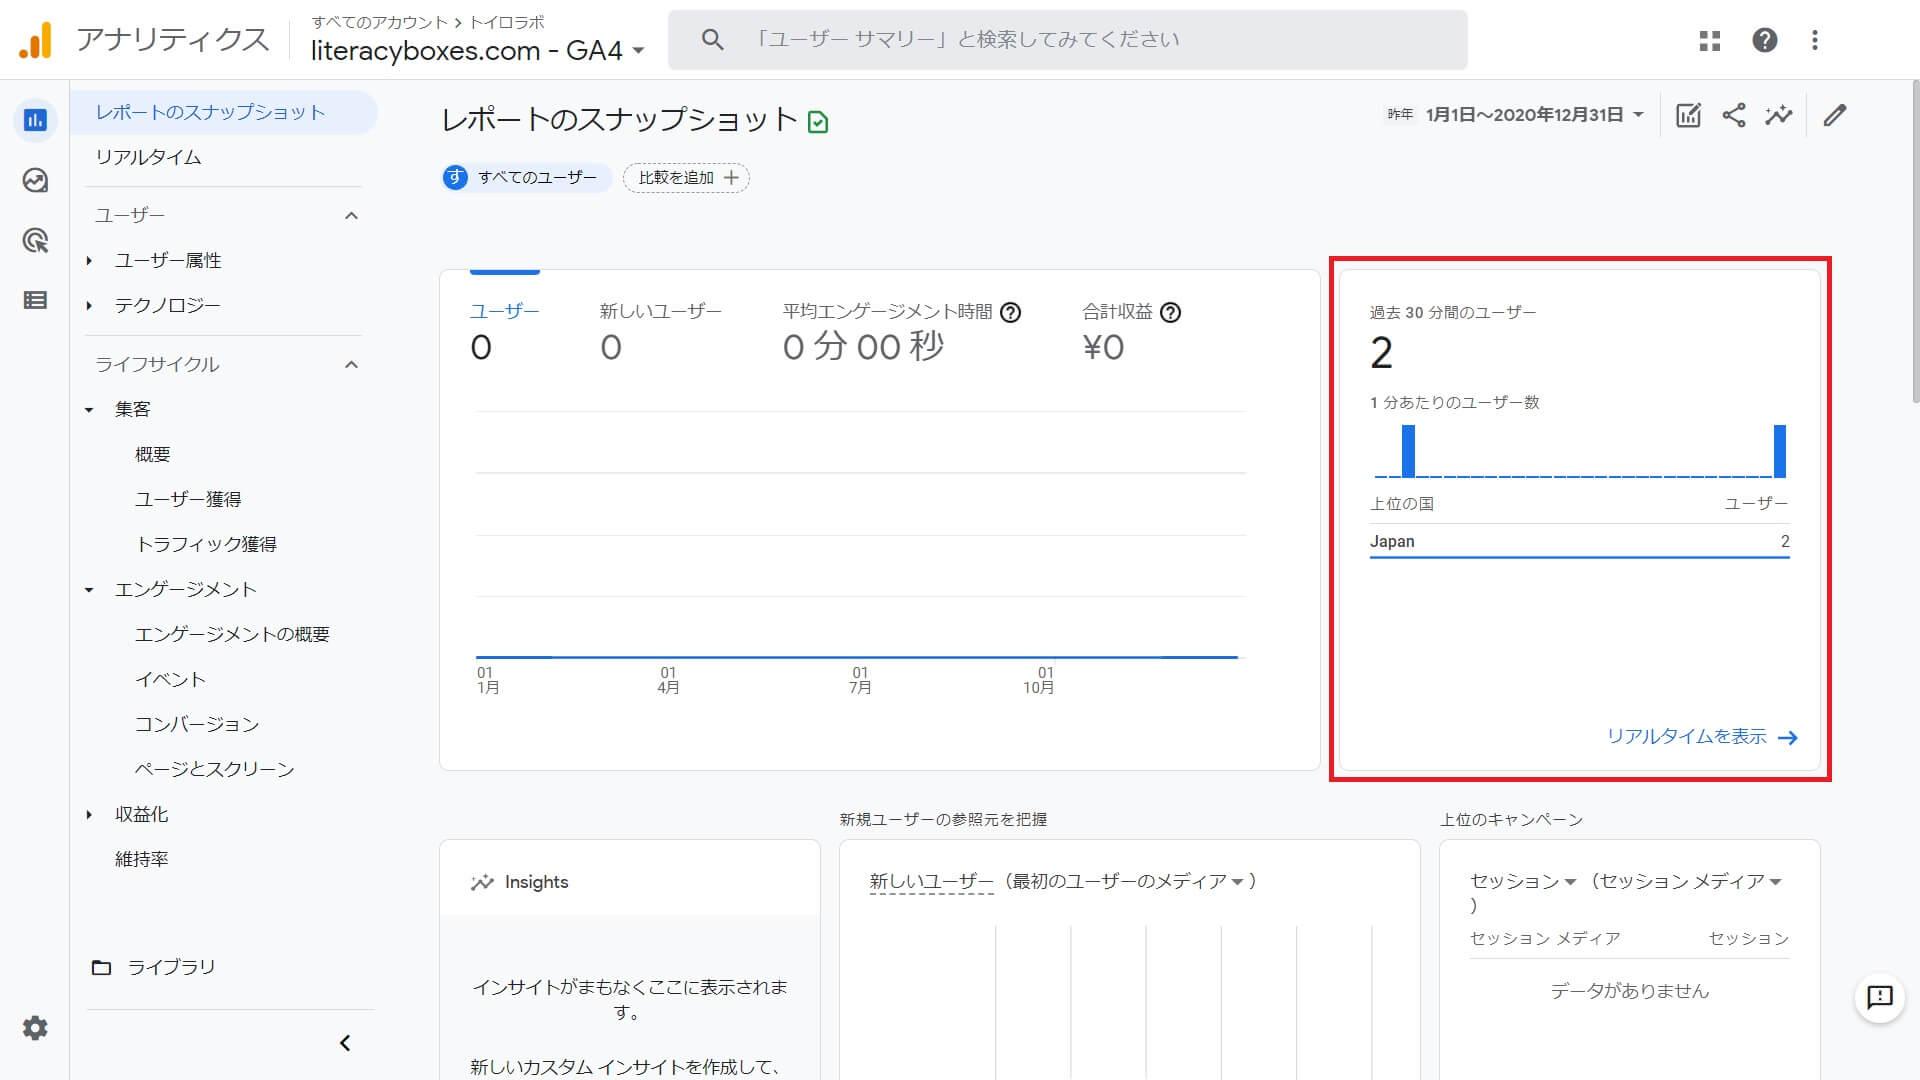 Googleアナリティクス-GA4リアルタイムレポート